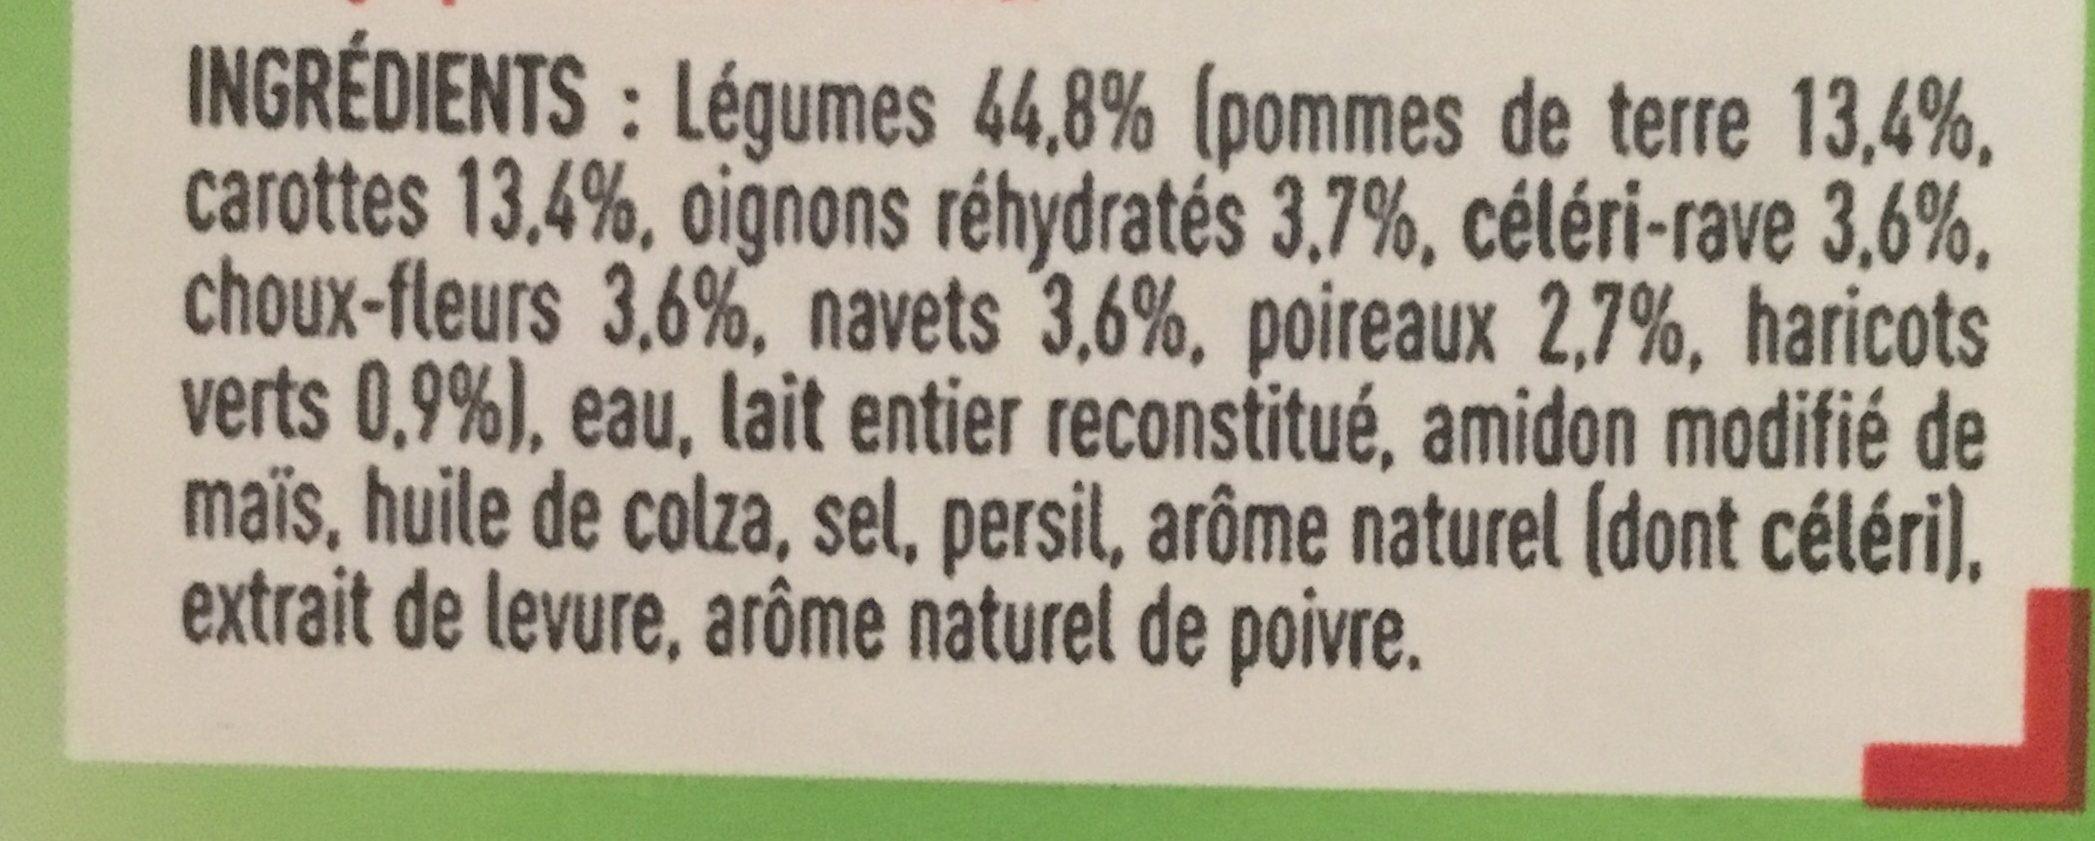 Mouliné de légumes variés - Ingrediënten - fr